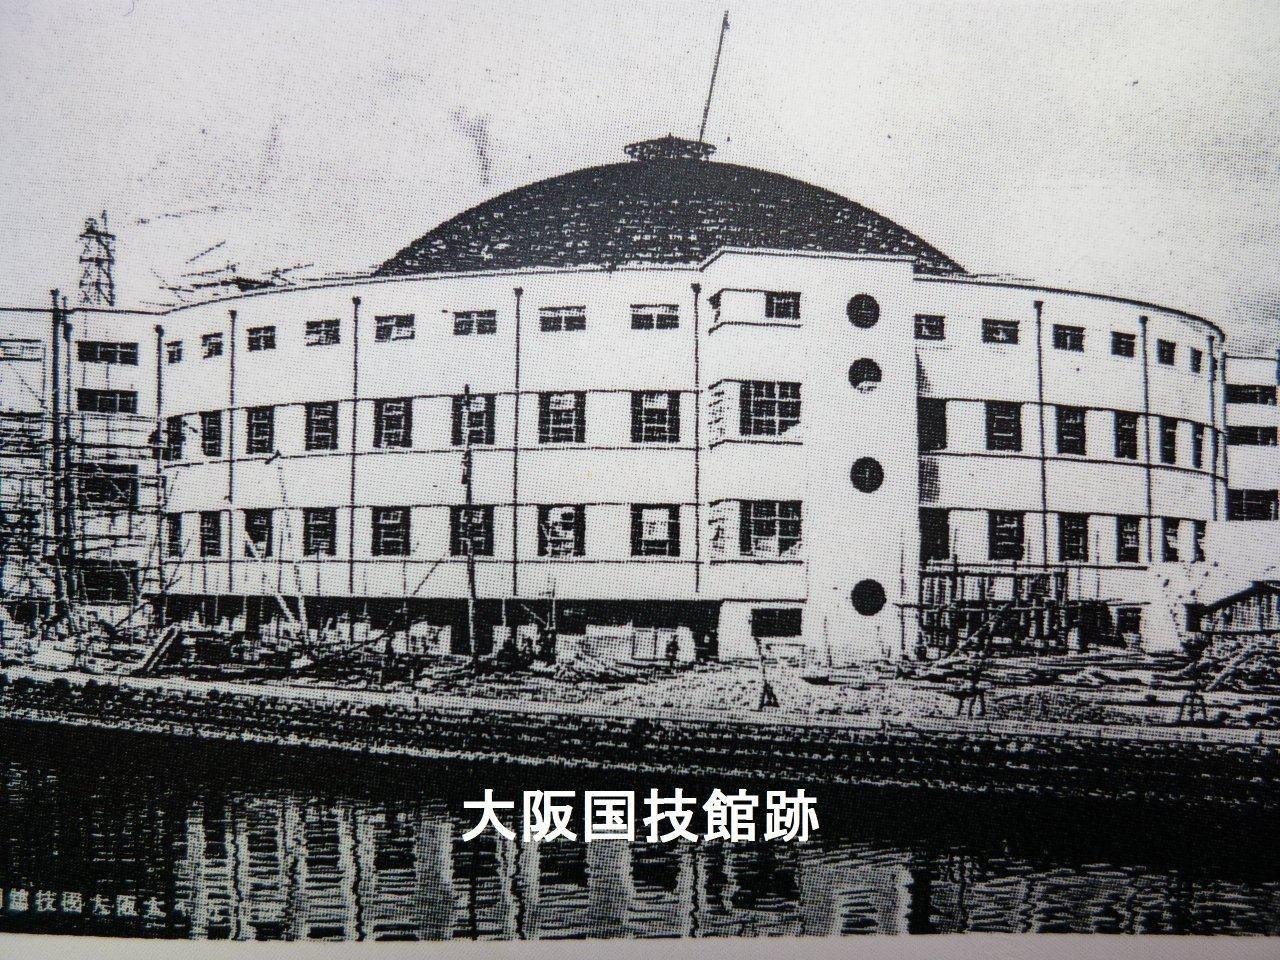 Kokugikan (Merci http://www.city.osaka.lg.jp/hodoshiryo/joto/0000241992.html)